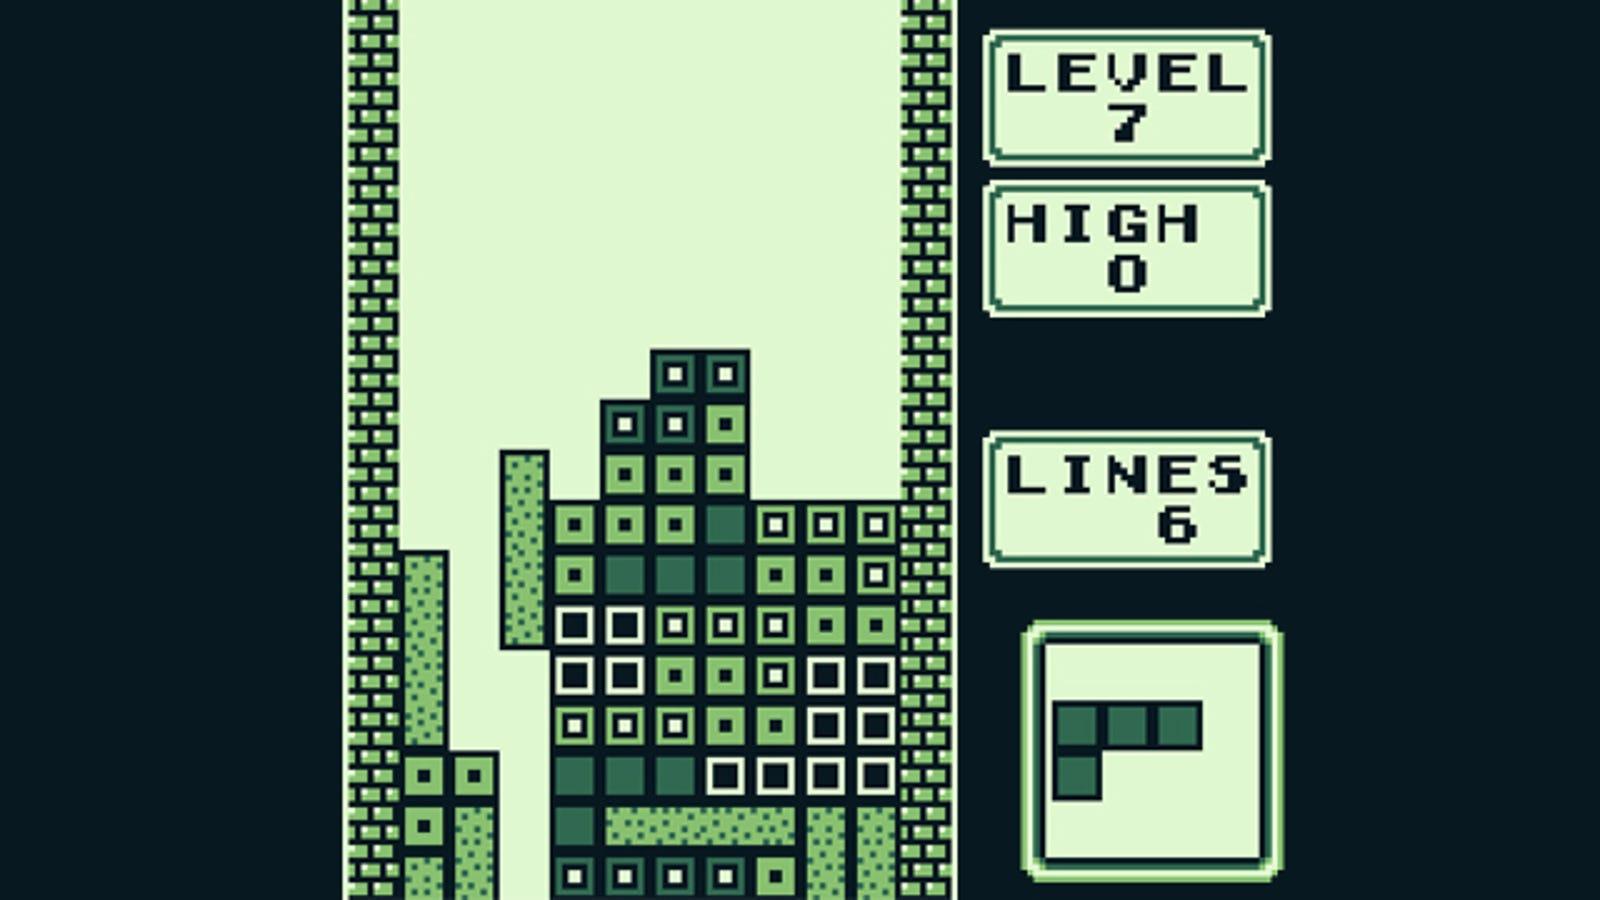 How Tetris game will help get rid of unpleasant memories